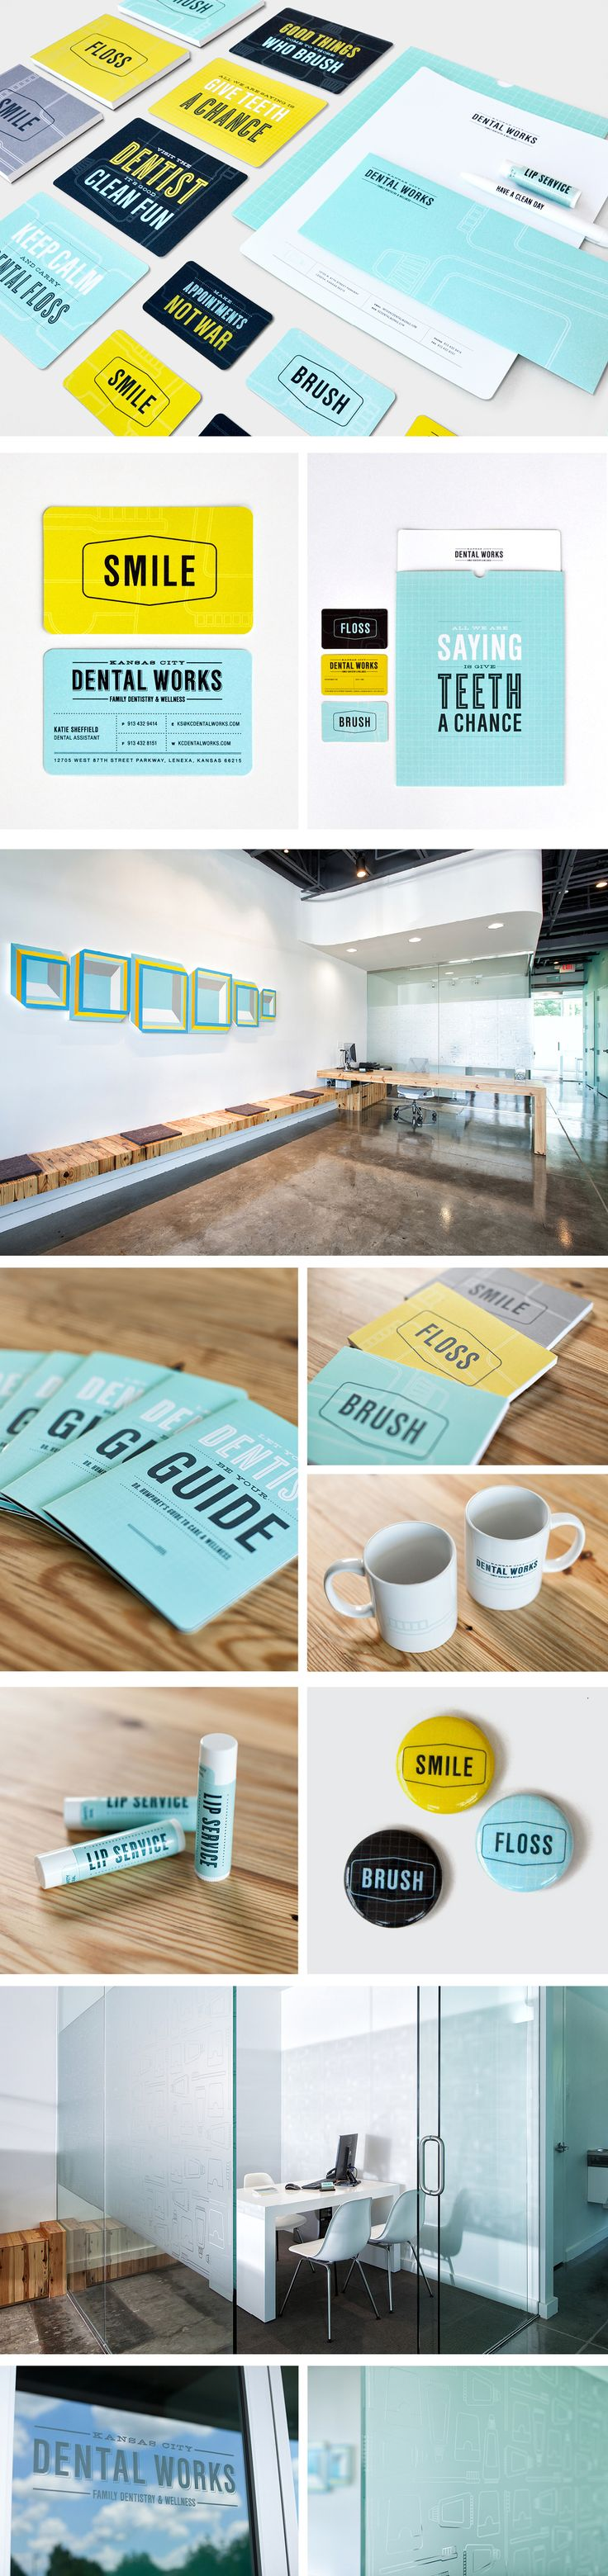 KC Dental Works | Branding Copywriting Design Signage Typography | Design Ranch - Branding CHARTRUSE, navy, grey and aqua